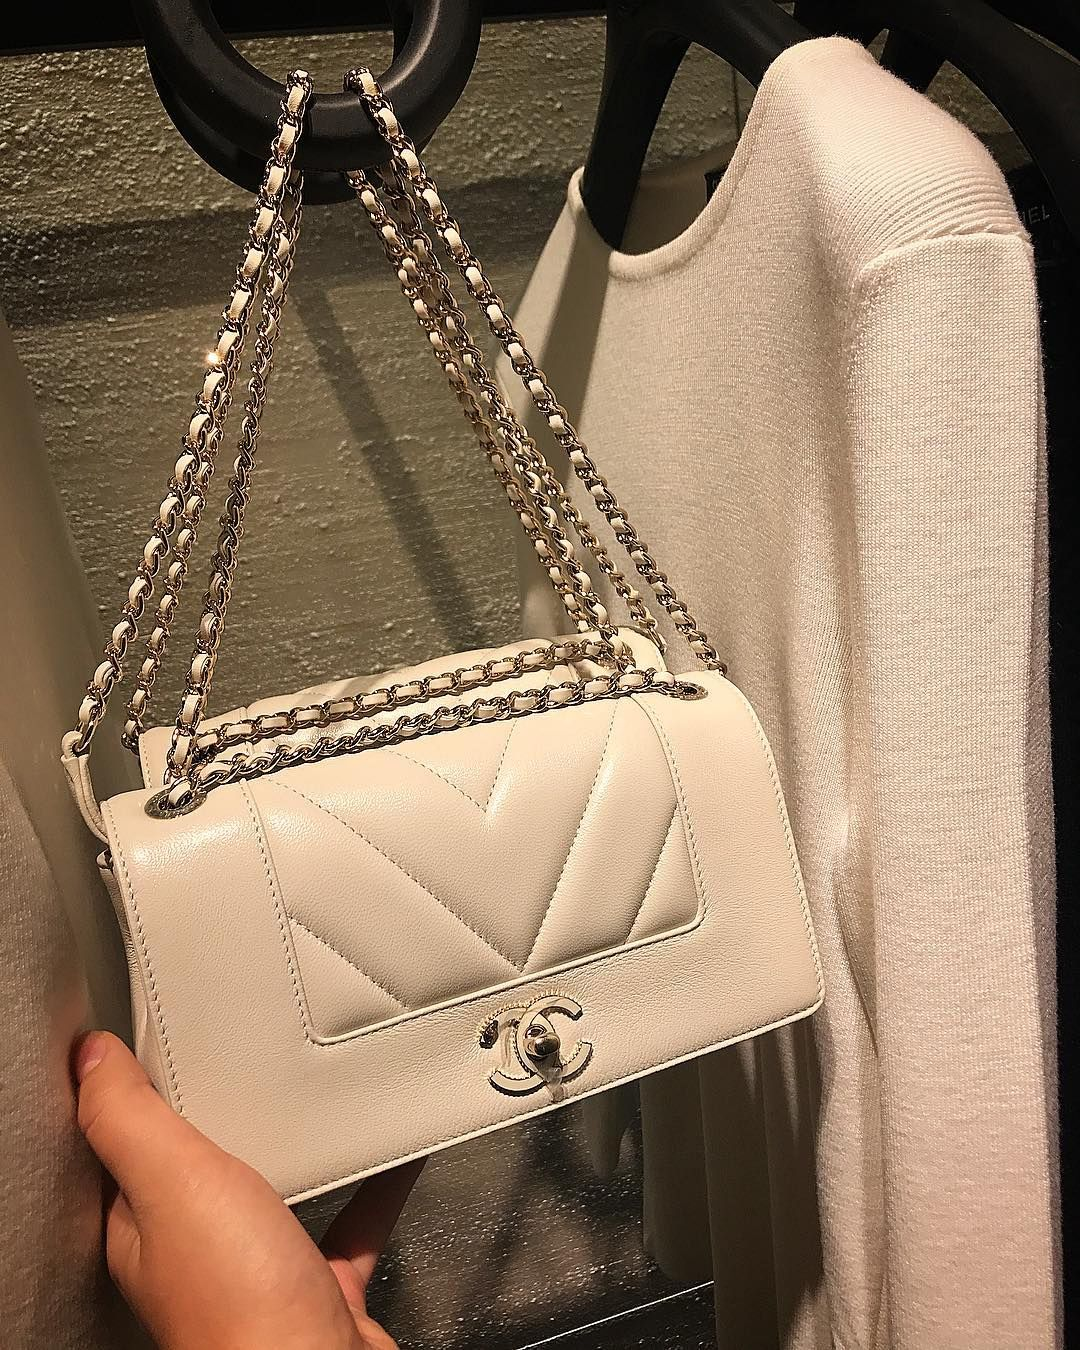 0cc24b05a00d Chanel Mademoiselle Vintage Chevron Bag | B A G A D D I C T ...